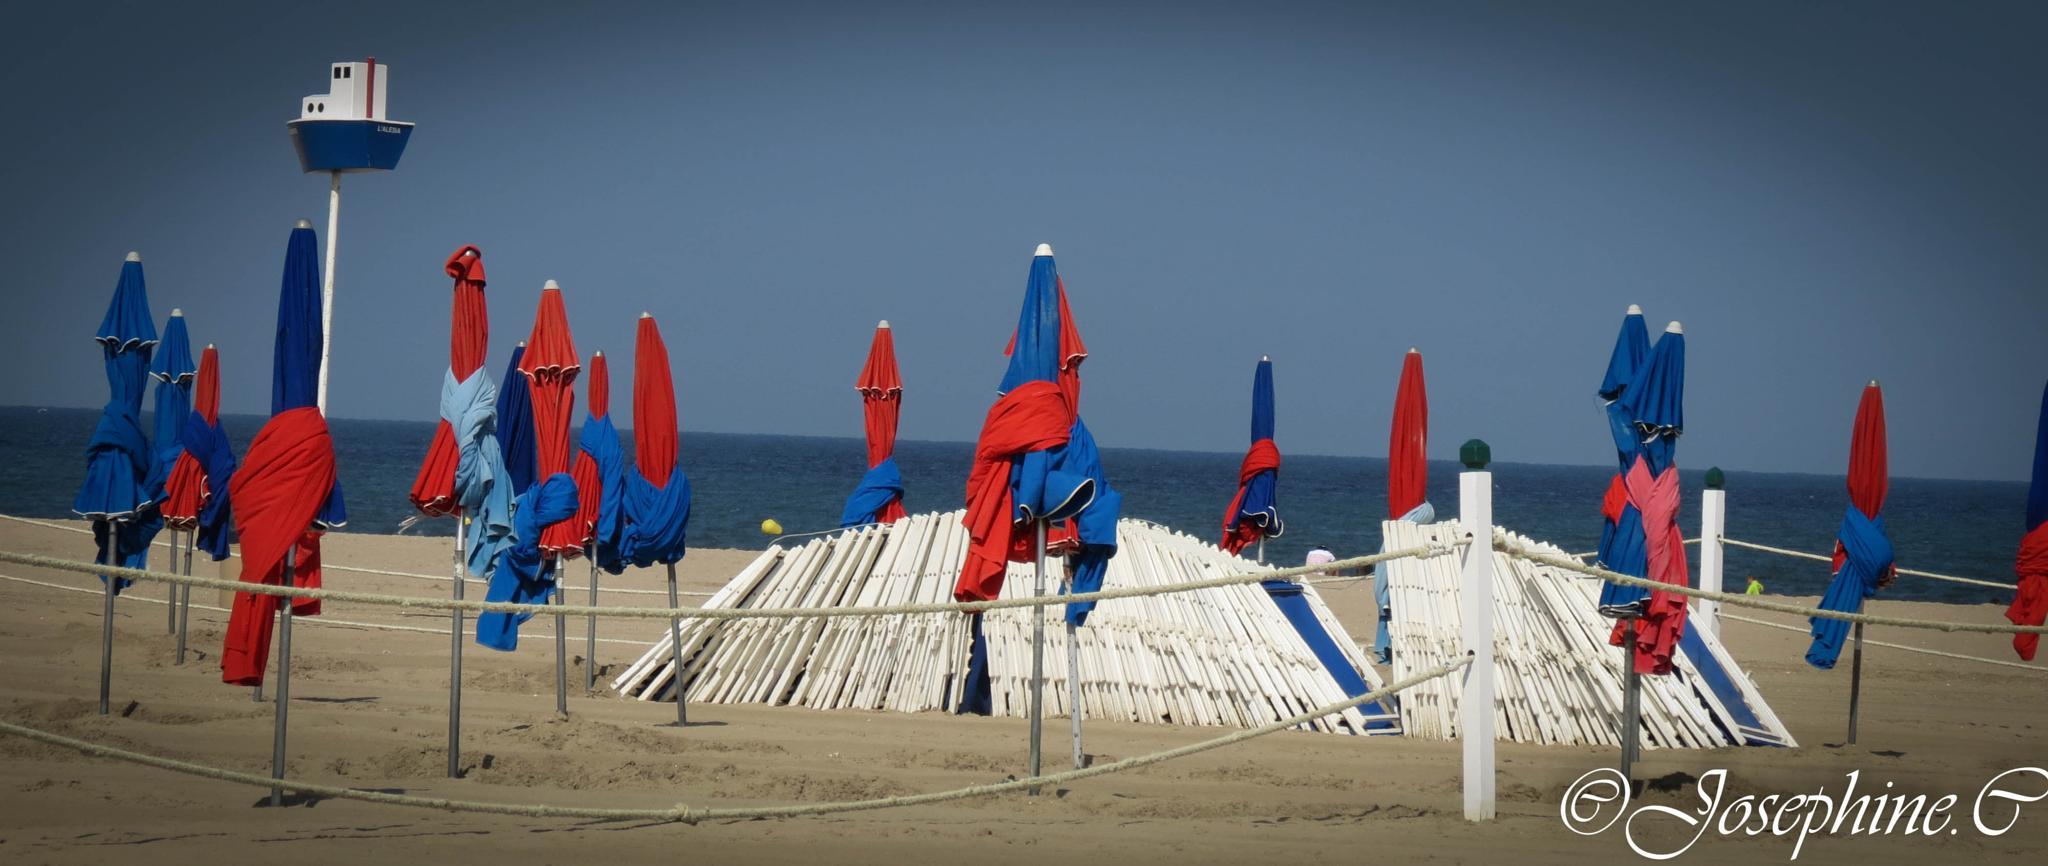 plage de Deauville . by josephine Campi